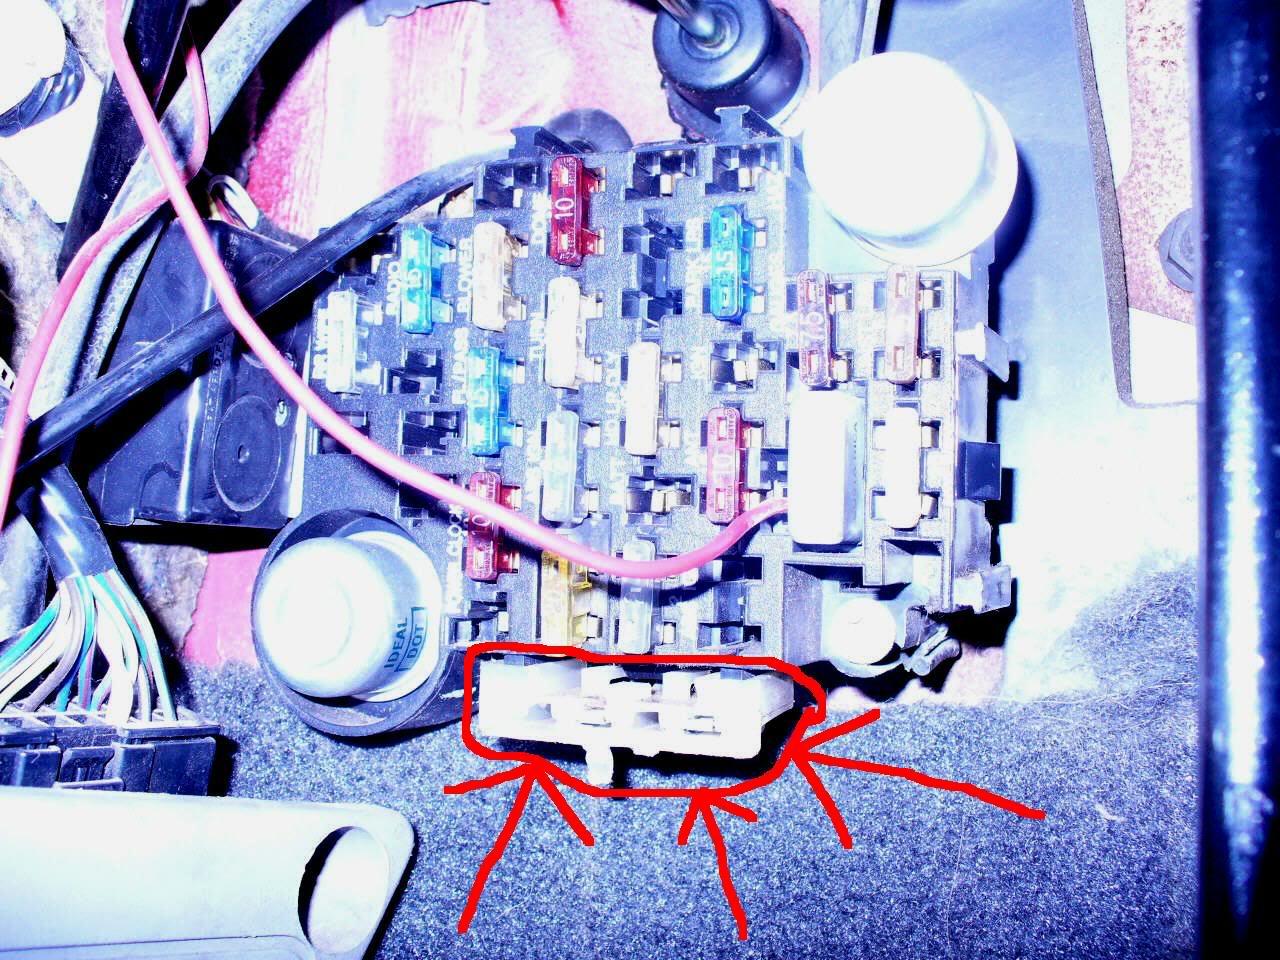 2010 Jeep Grand Cherokee Fuse Box Diagram Wiper Circuit Breaker Jeep Cherokee Forum